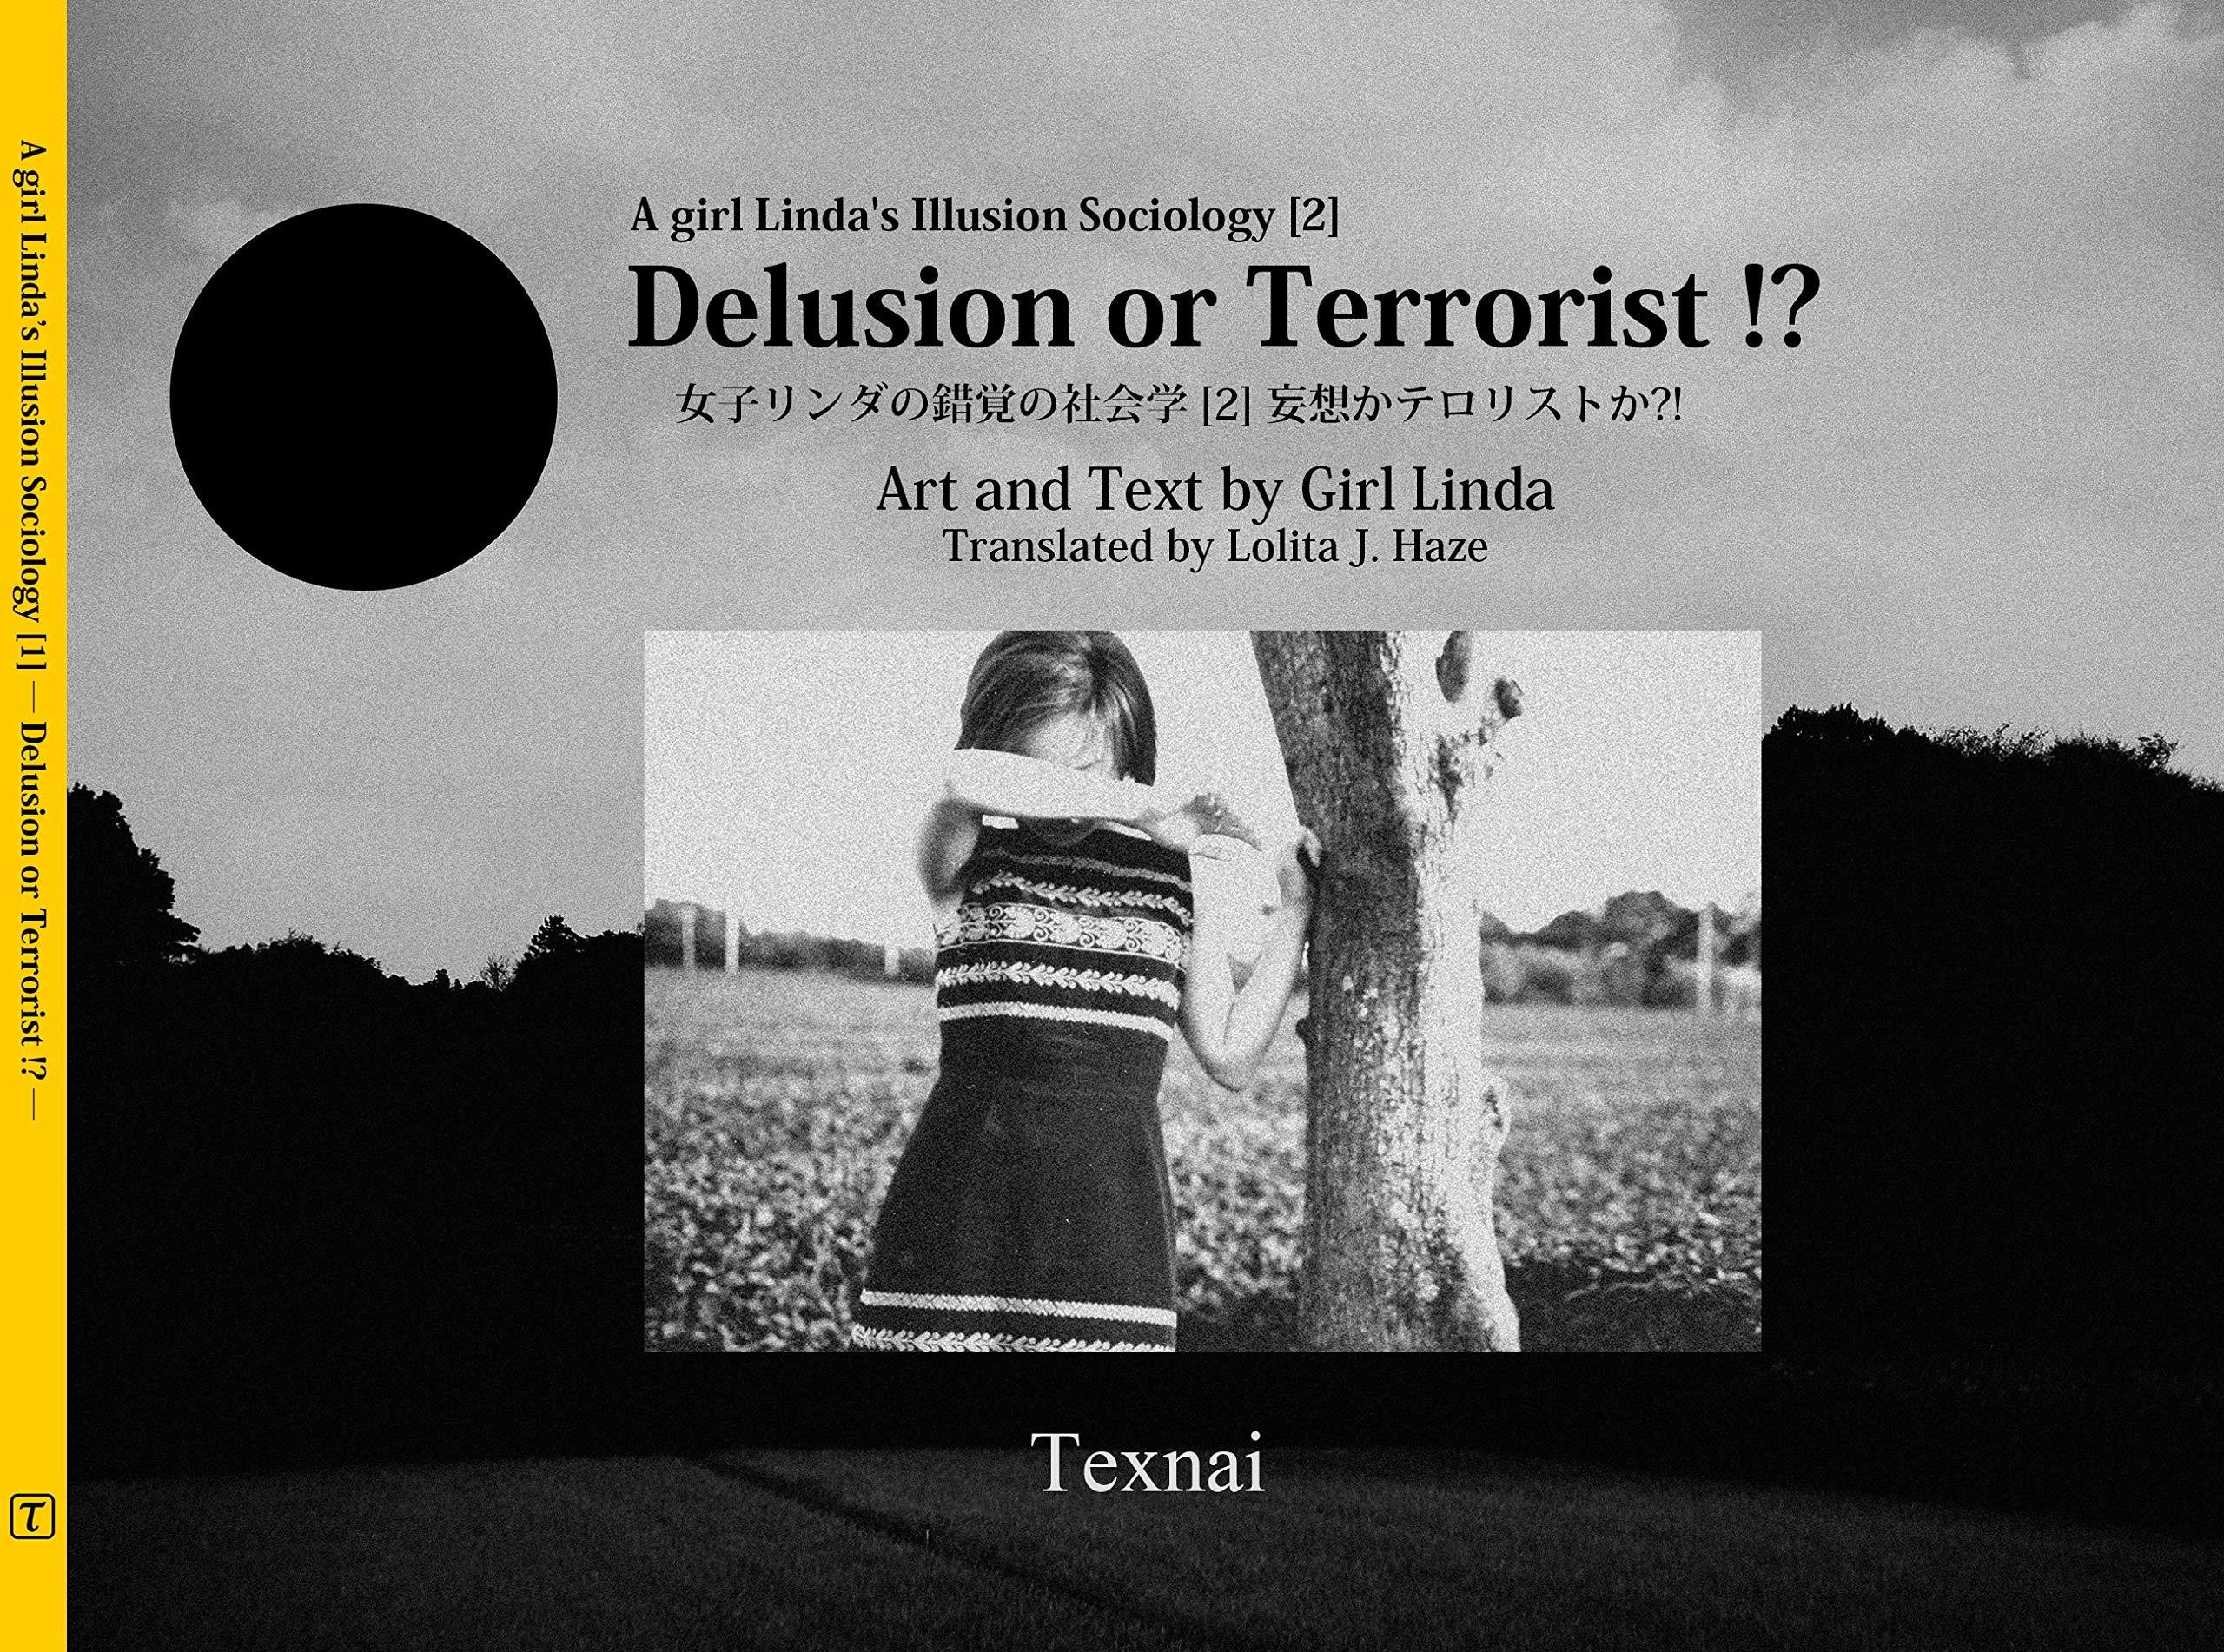 A Girl Linda's Illusion Sociology [ 1 ]: Delusion or Terrorist !?